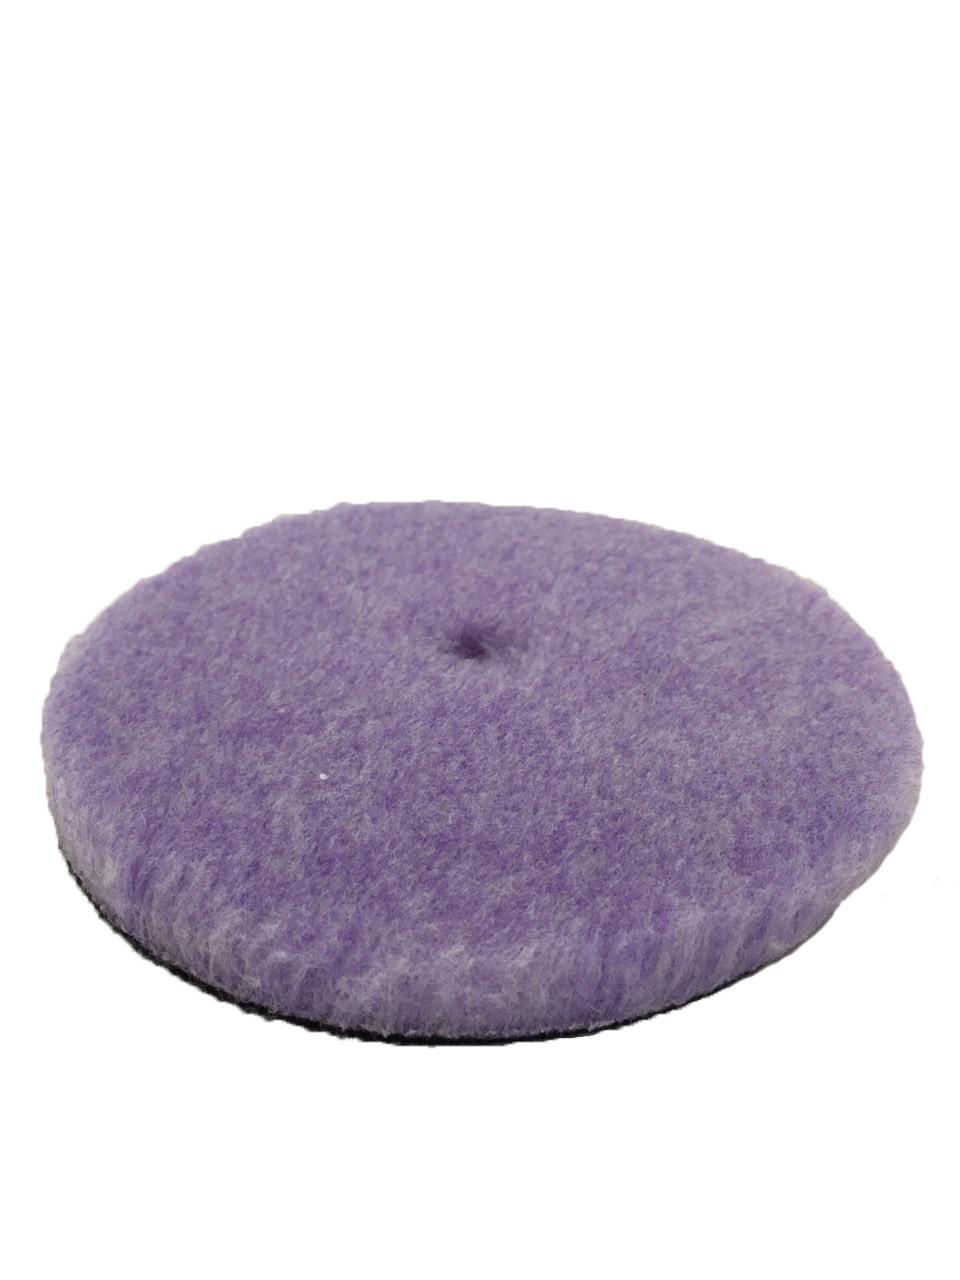 Полировальный круг гибридная шерсть - Lake Country Purple Foamed Wool Buffing/Polishing 150 мм. (58-32625WH-1)